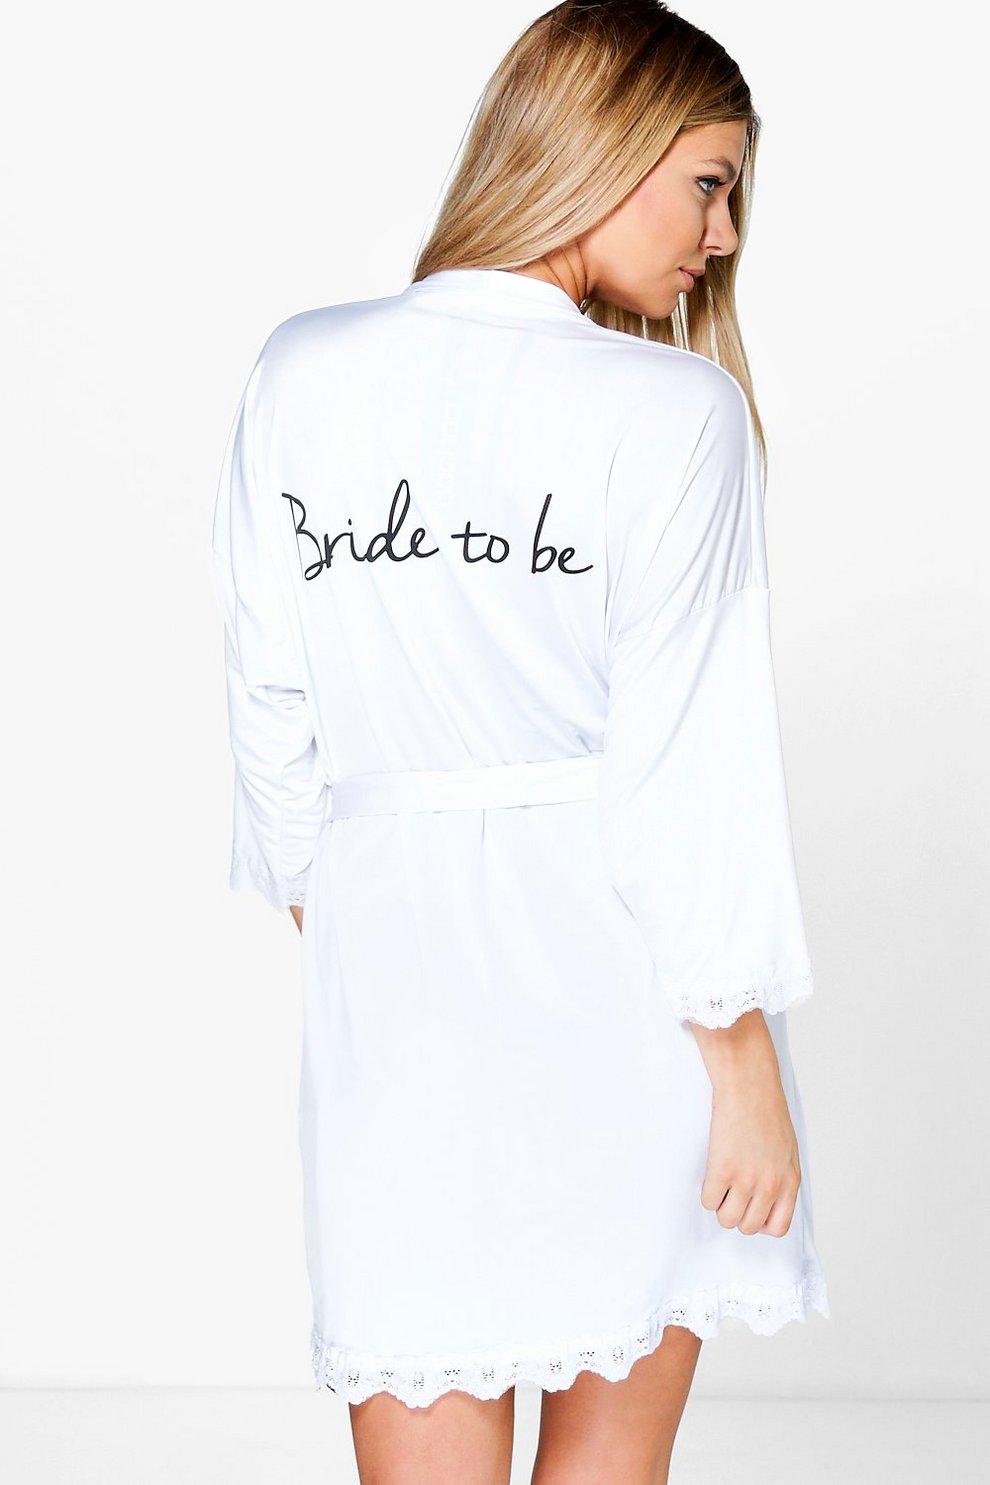 a40b2f370e Bride Slogan Slinky Robe